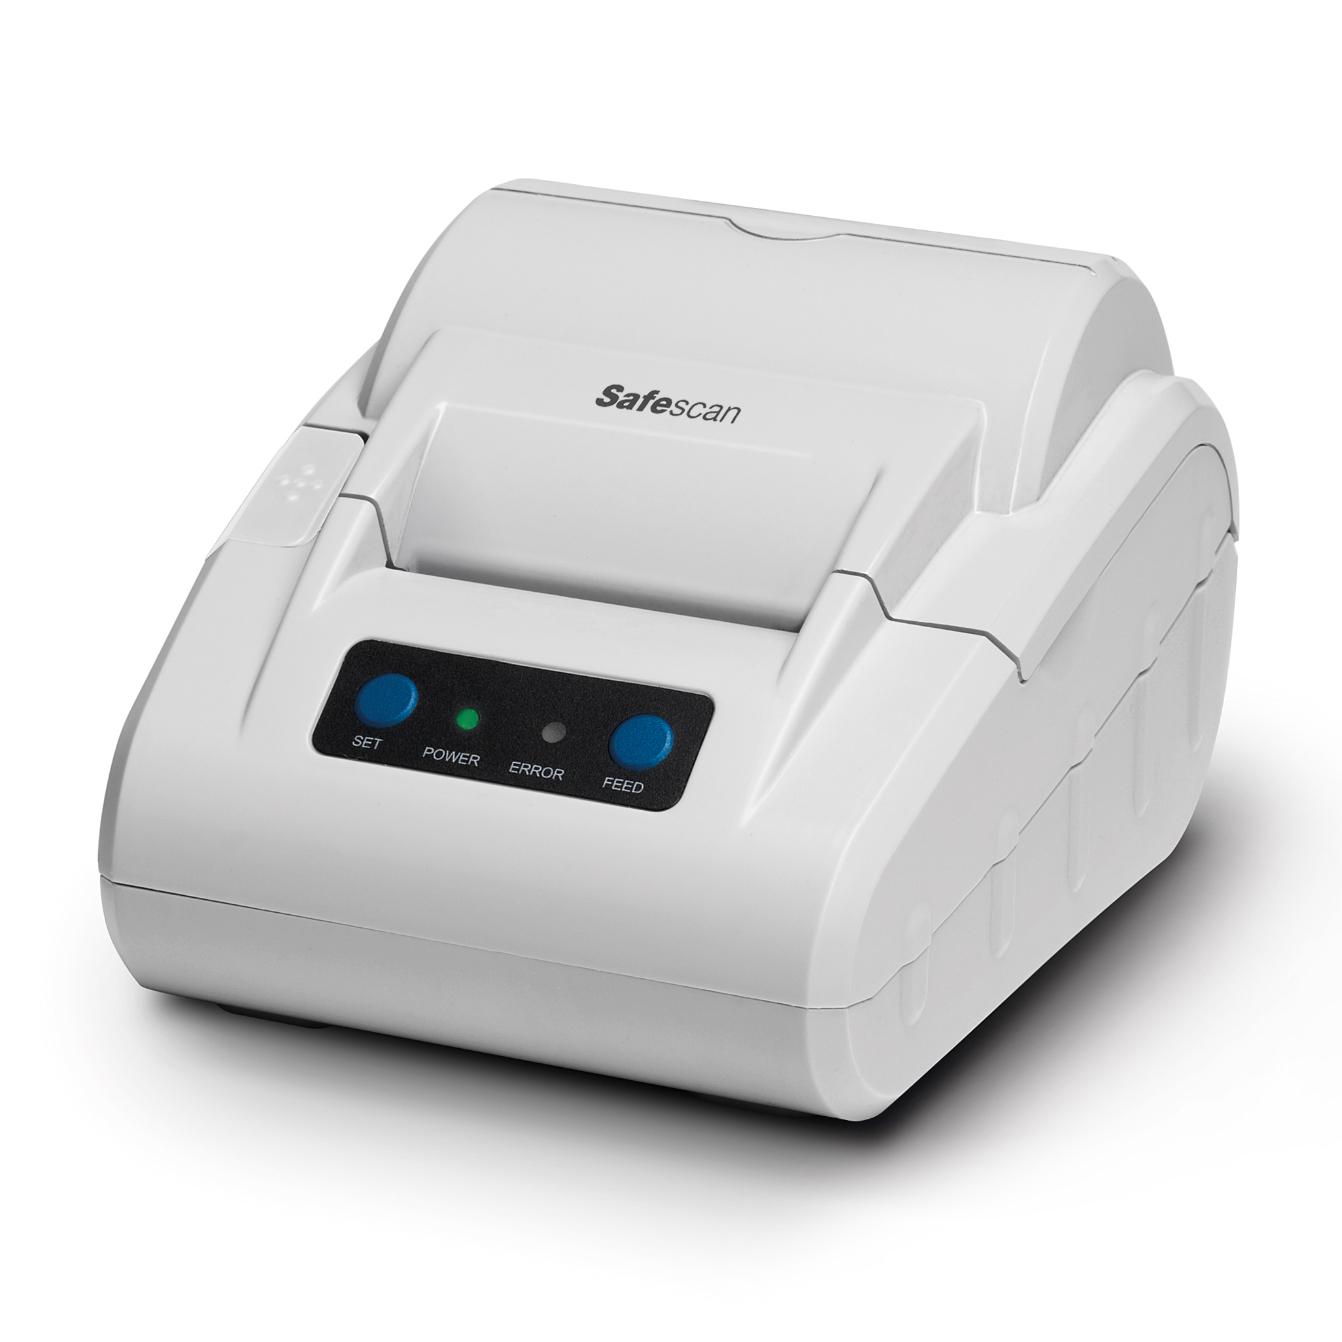 Safescan Thermal Receipt Printer Cash Total TP-230 Ref 134-0475